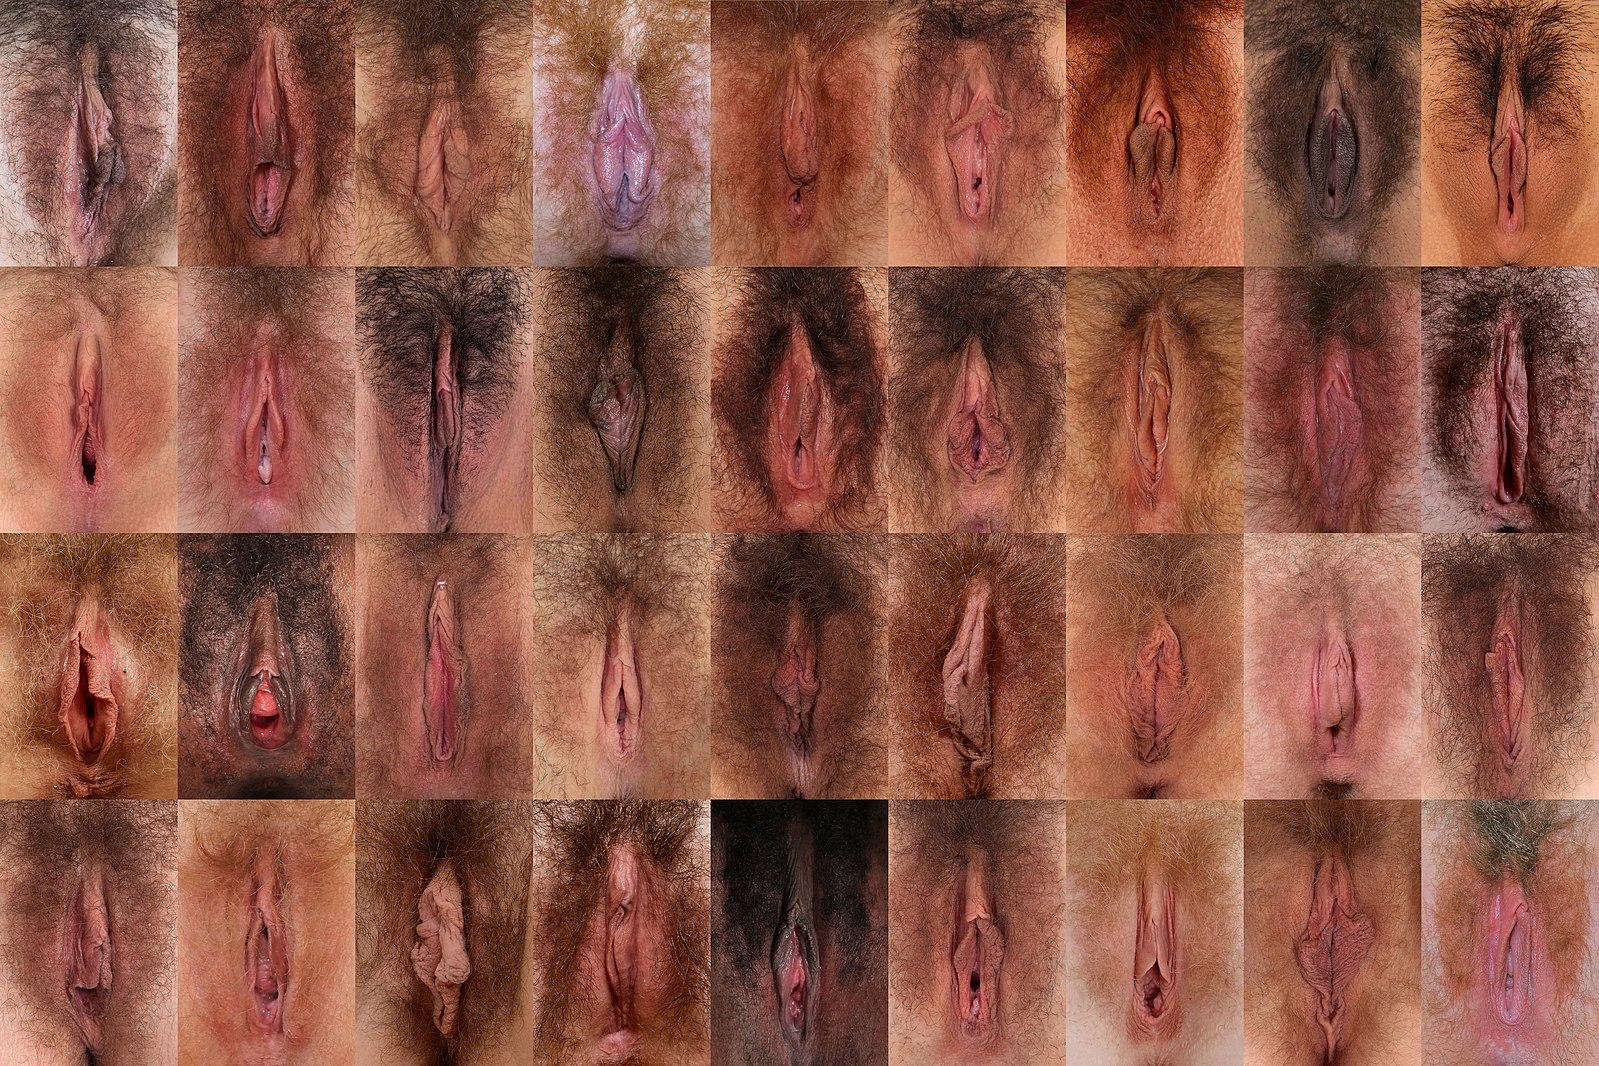 классификации фото вагин по